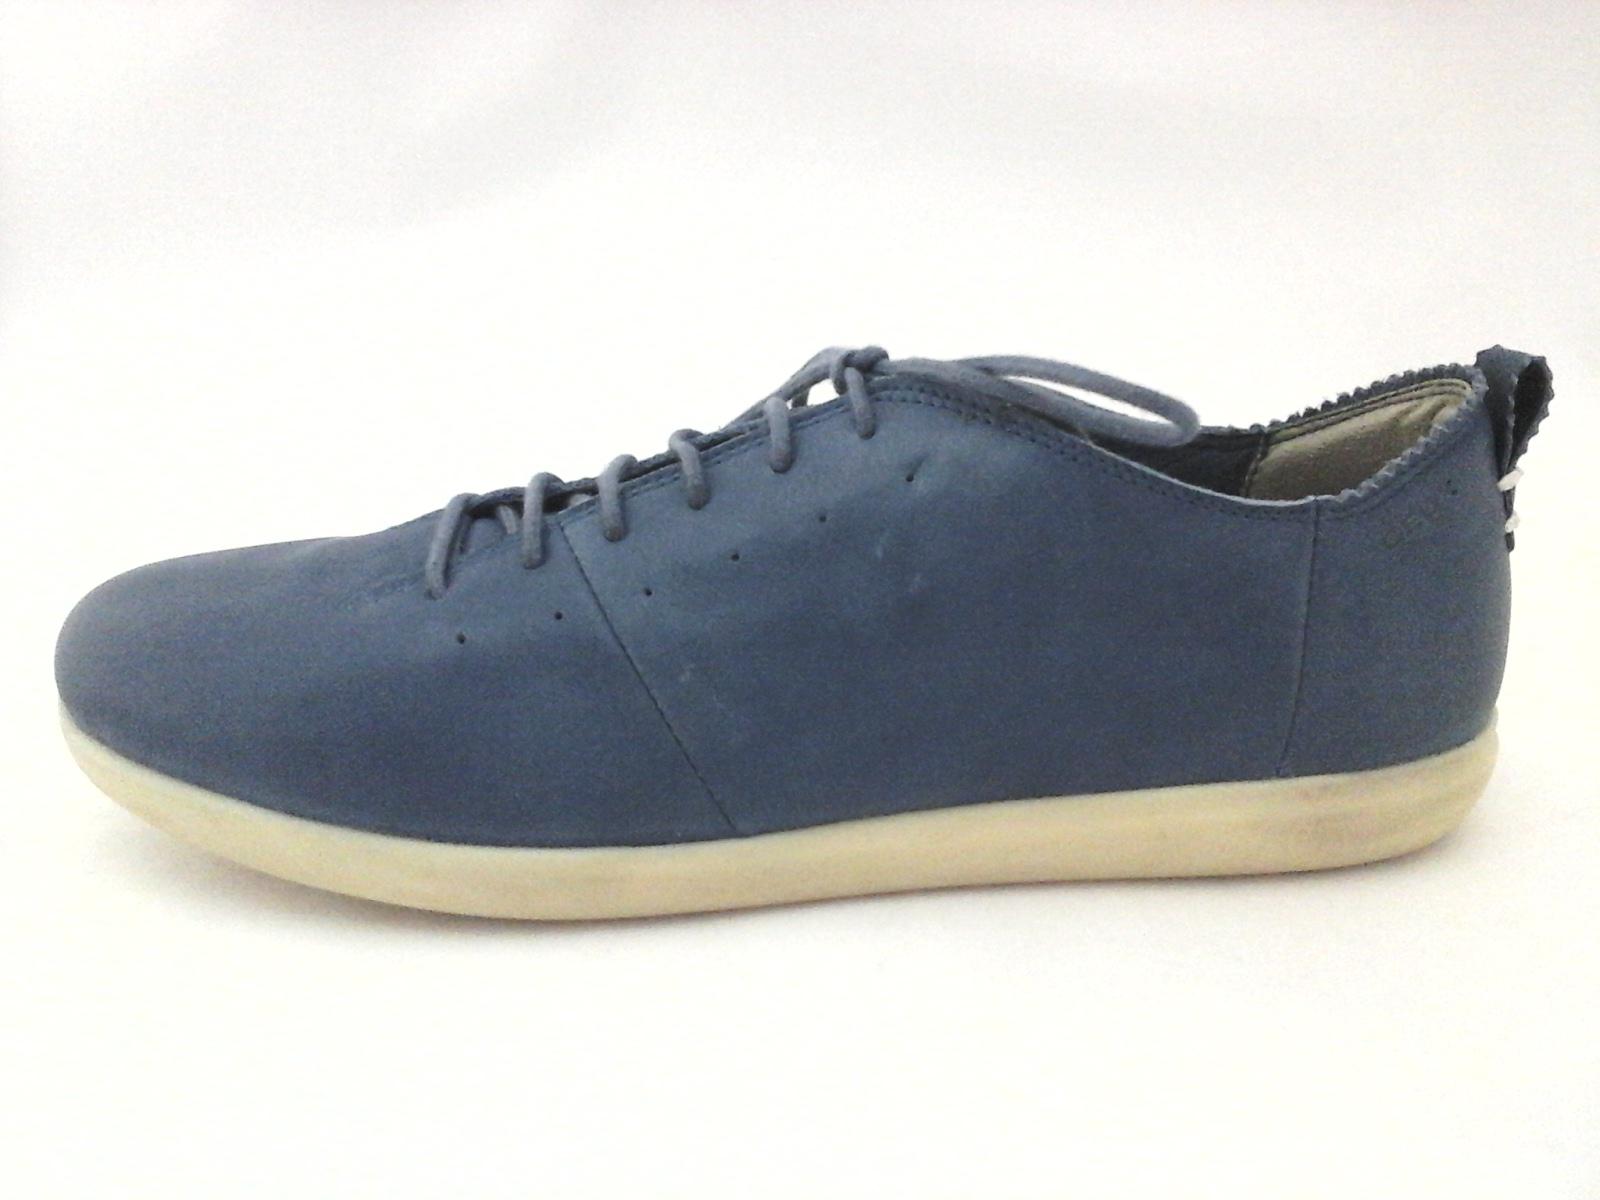 original de costura caliente gran surtido Calidad superior Geox Respira New Do Women's Walking Casual Comfort Oxford Shoes ...